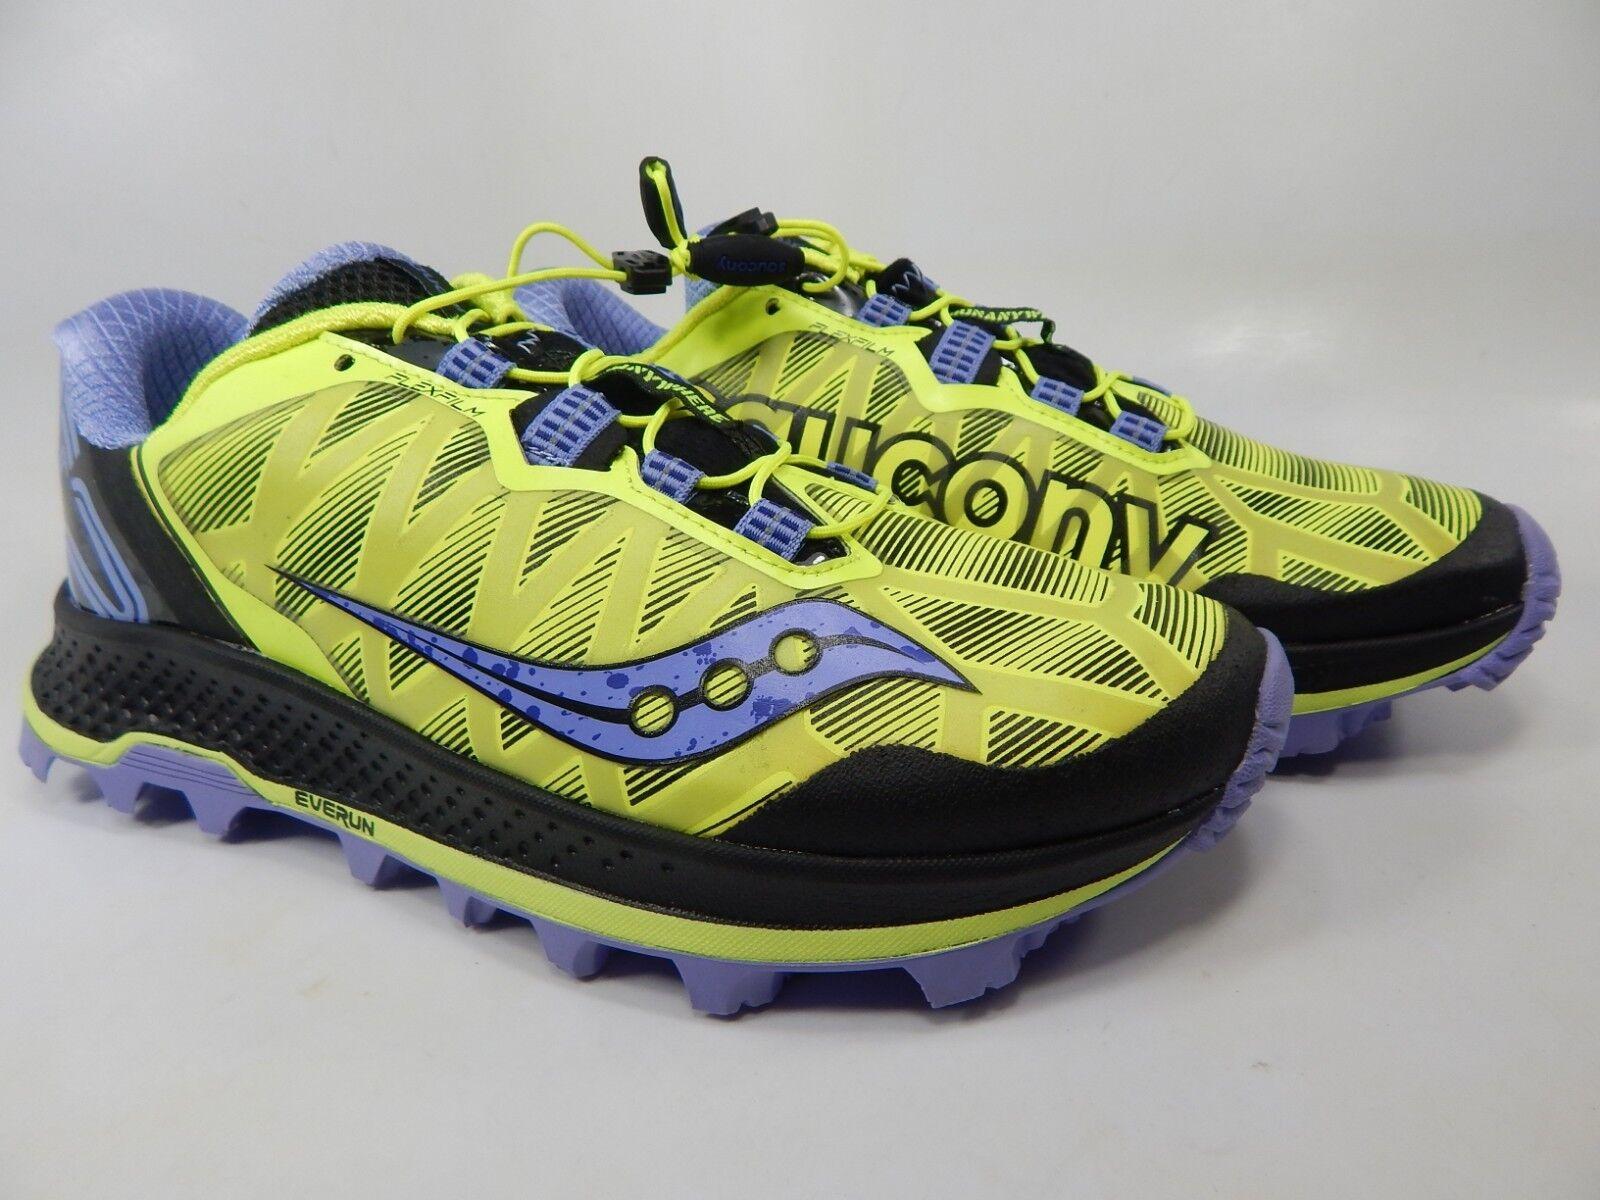 Saucony Koa San Taglia 8 M (B) Eu 39 Donna Scarpe da Corsa Trail Limone S10391-1